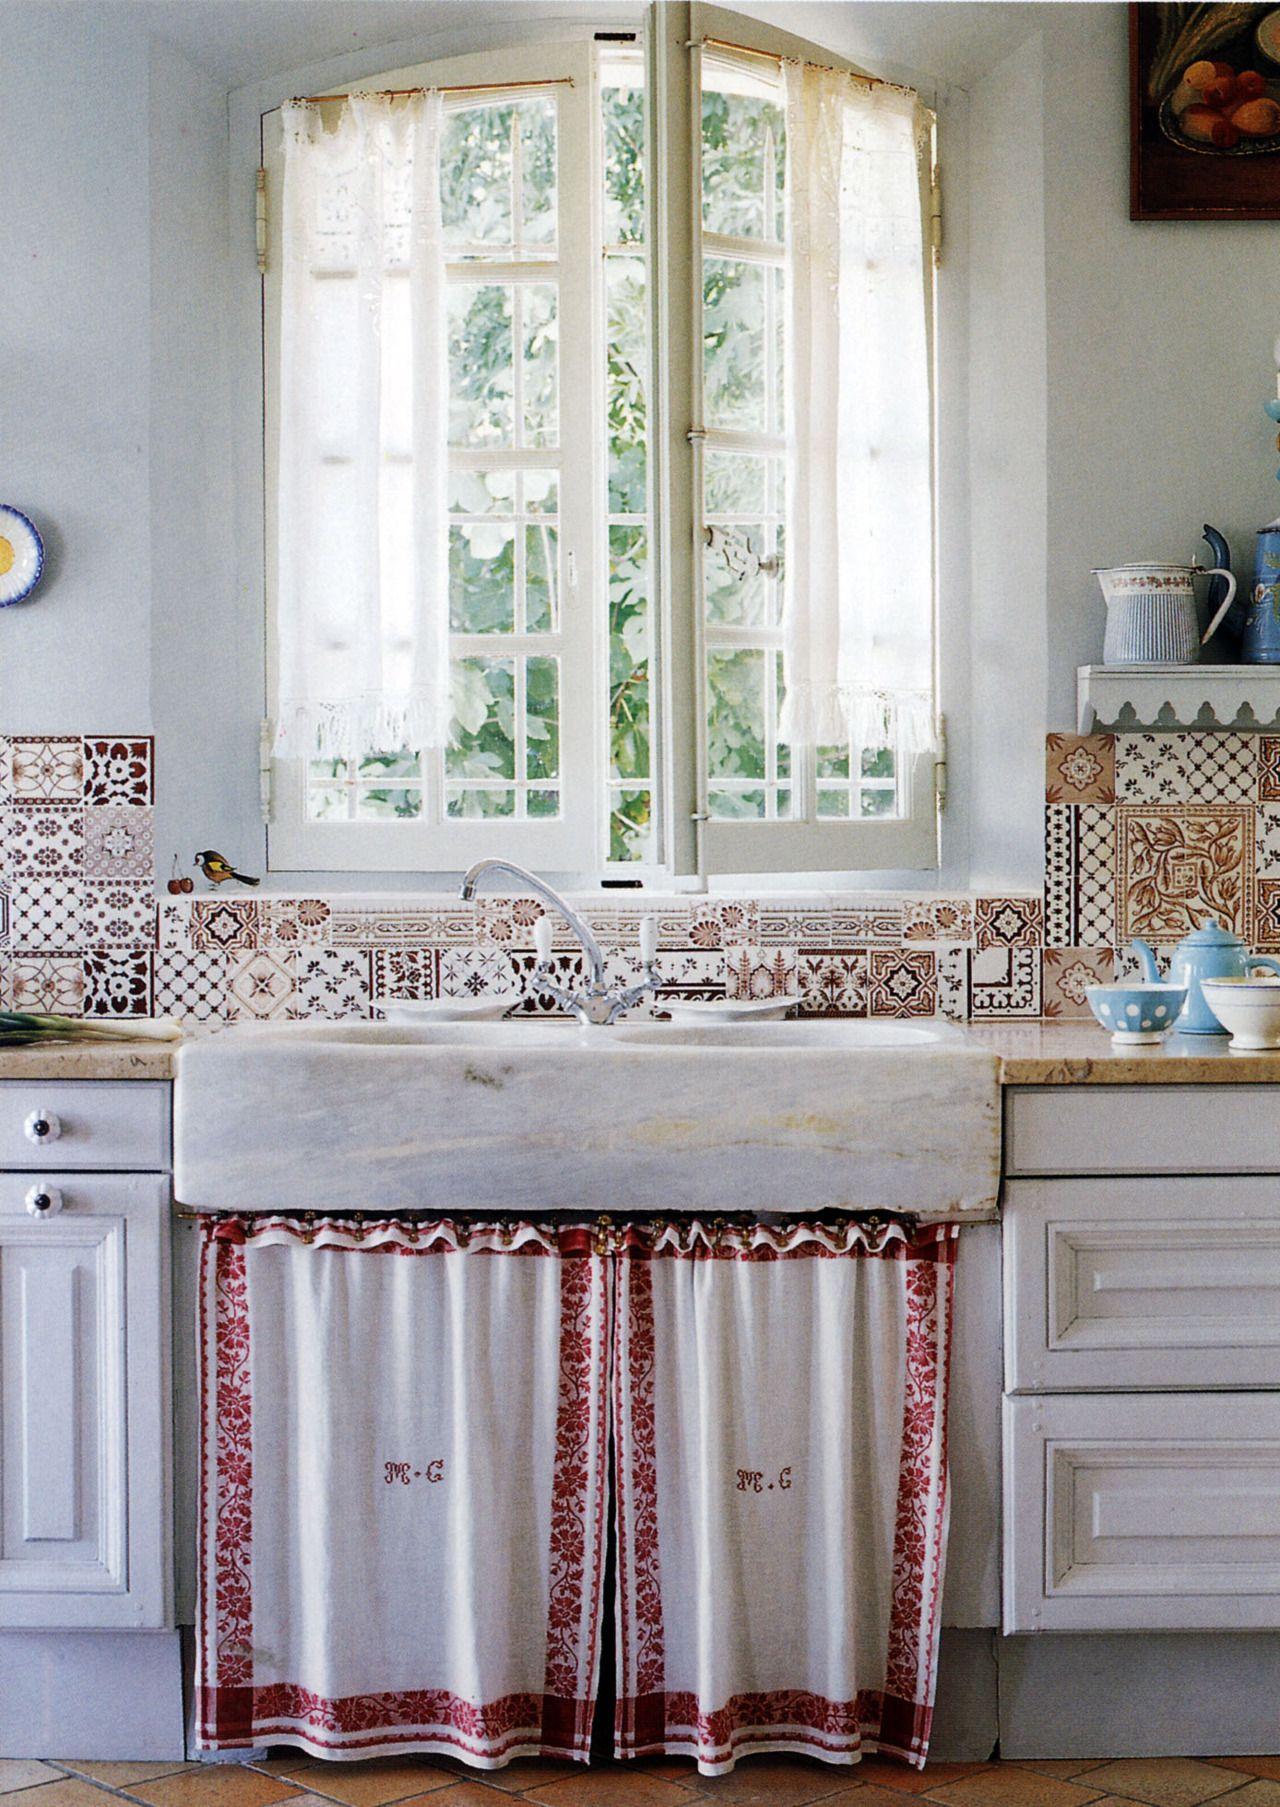 Kitchen sink without window  oldfashioned country kitchen  cuisine vintage  pinterest  sinks